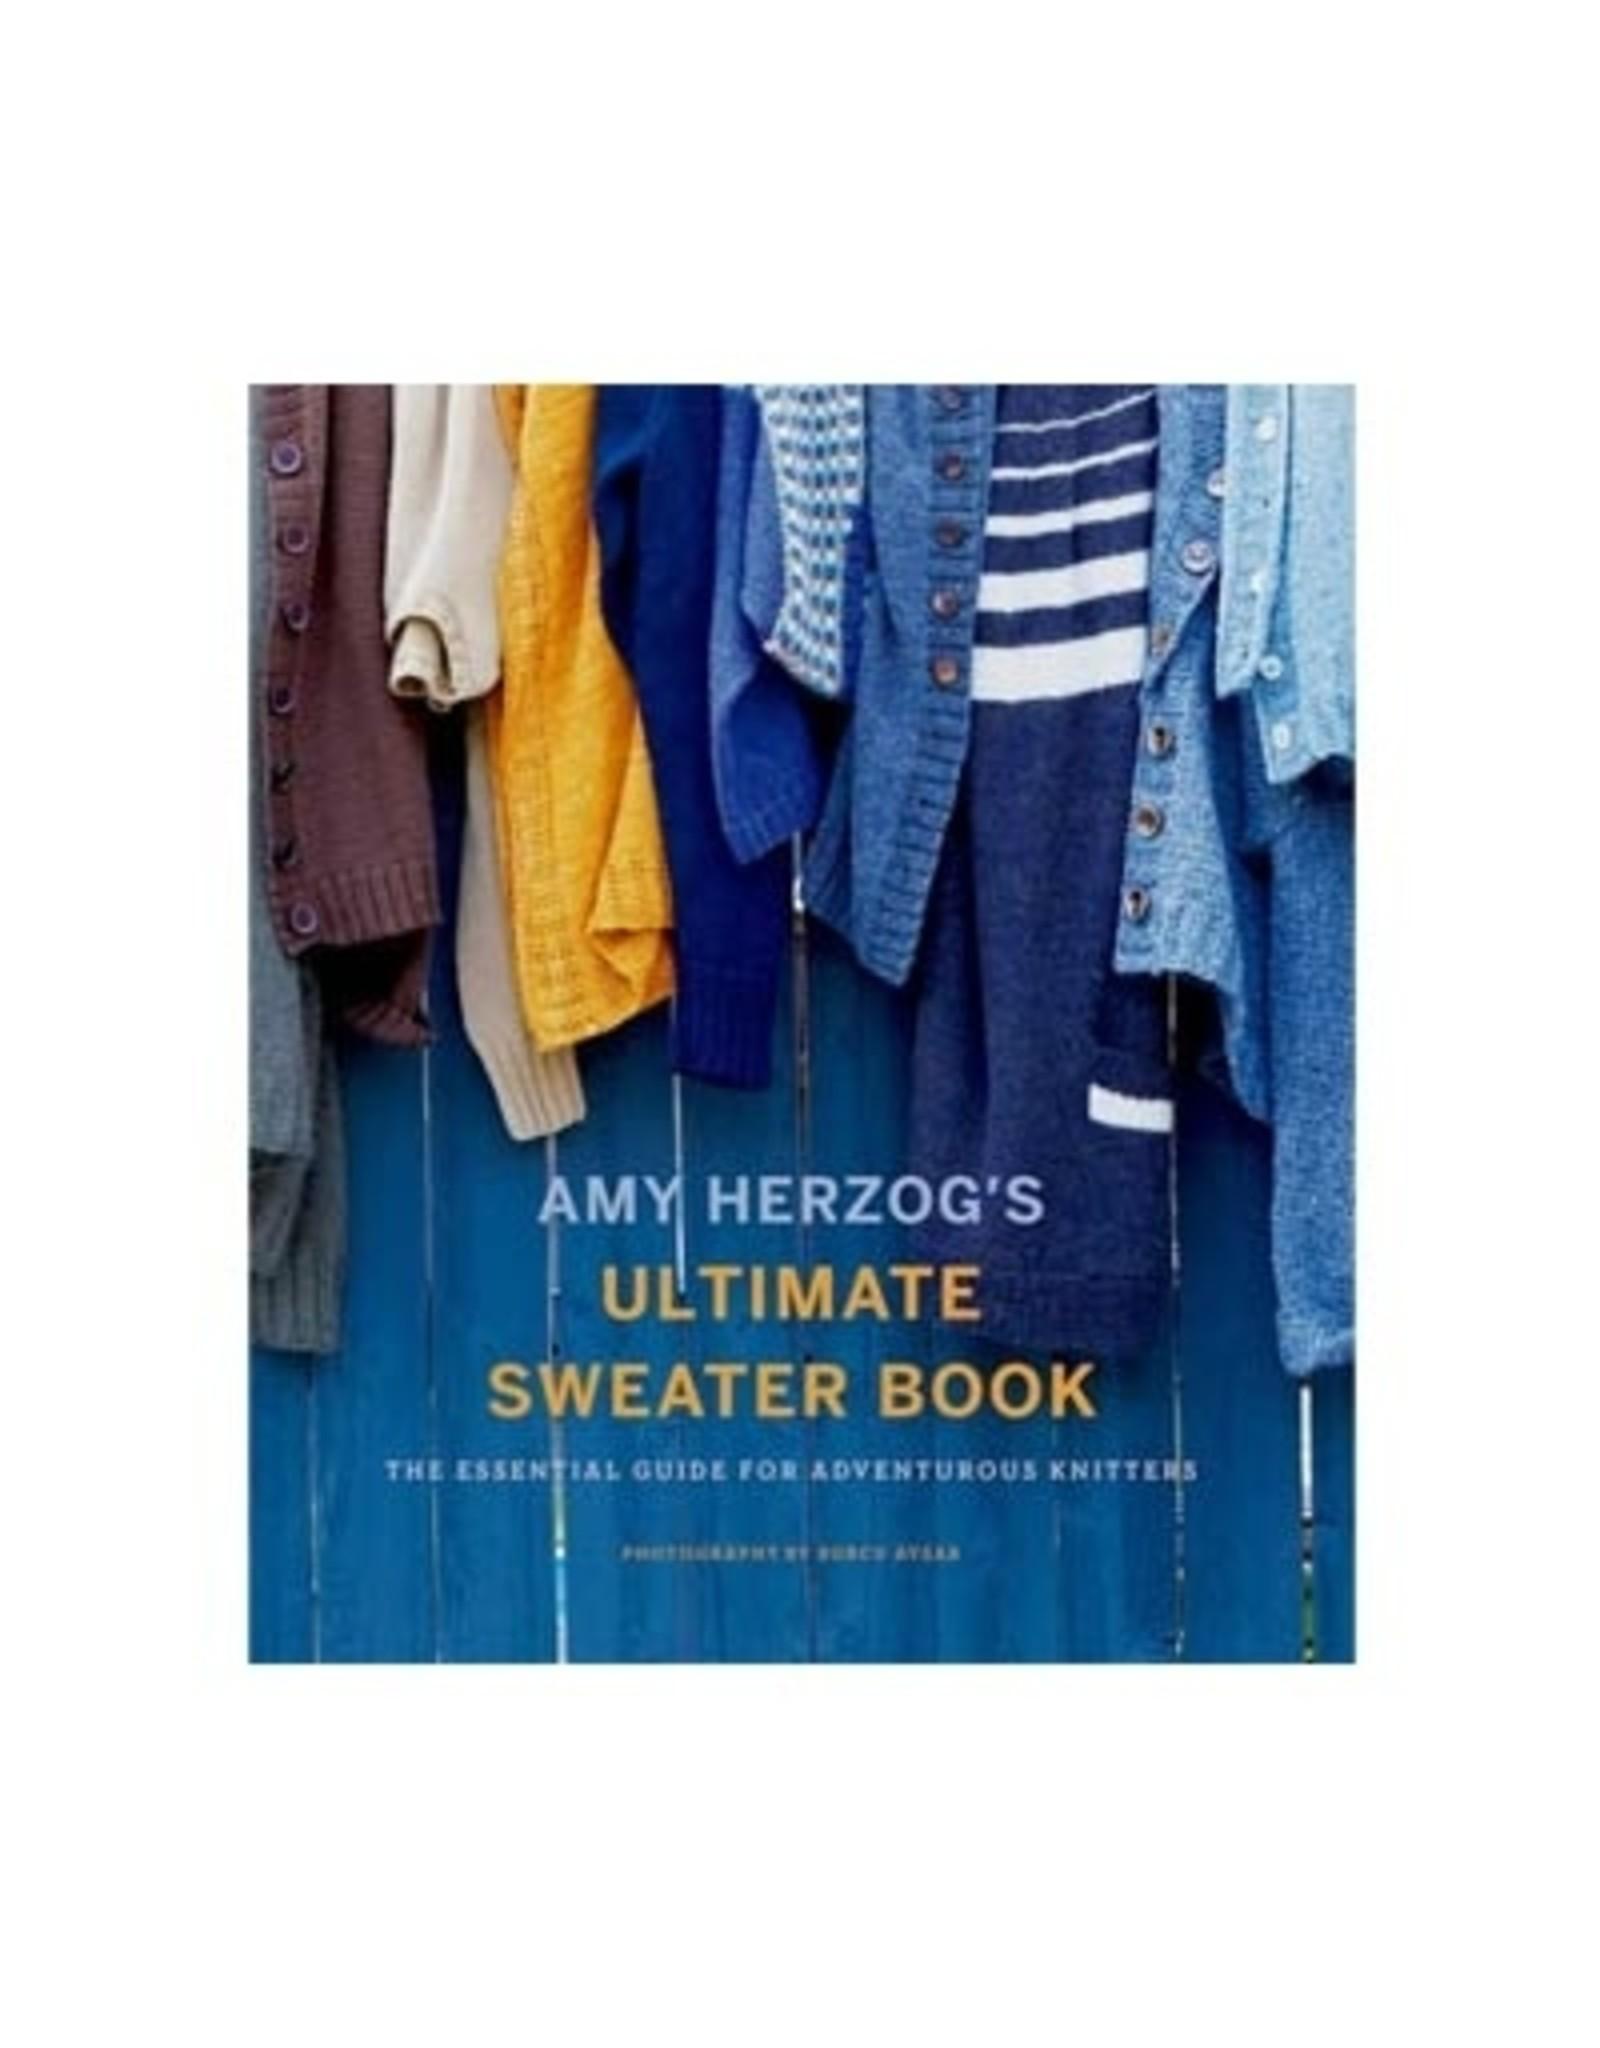 Amy Herzog - Ultimate sweater